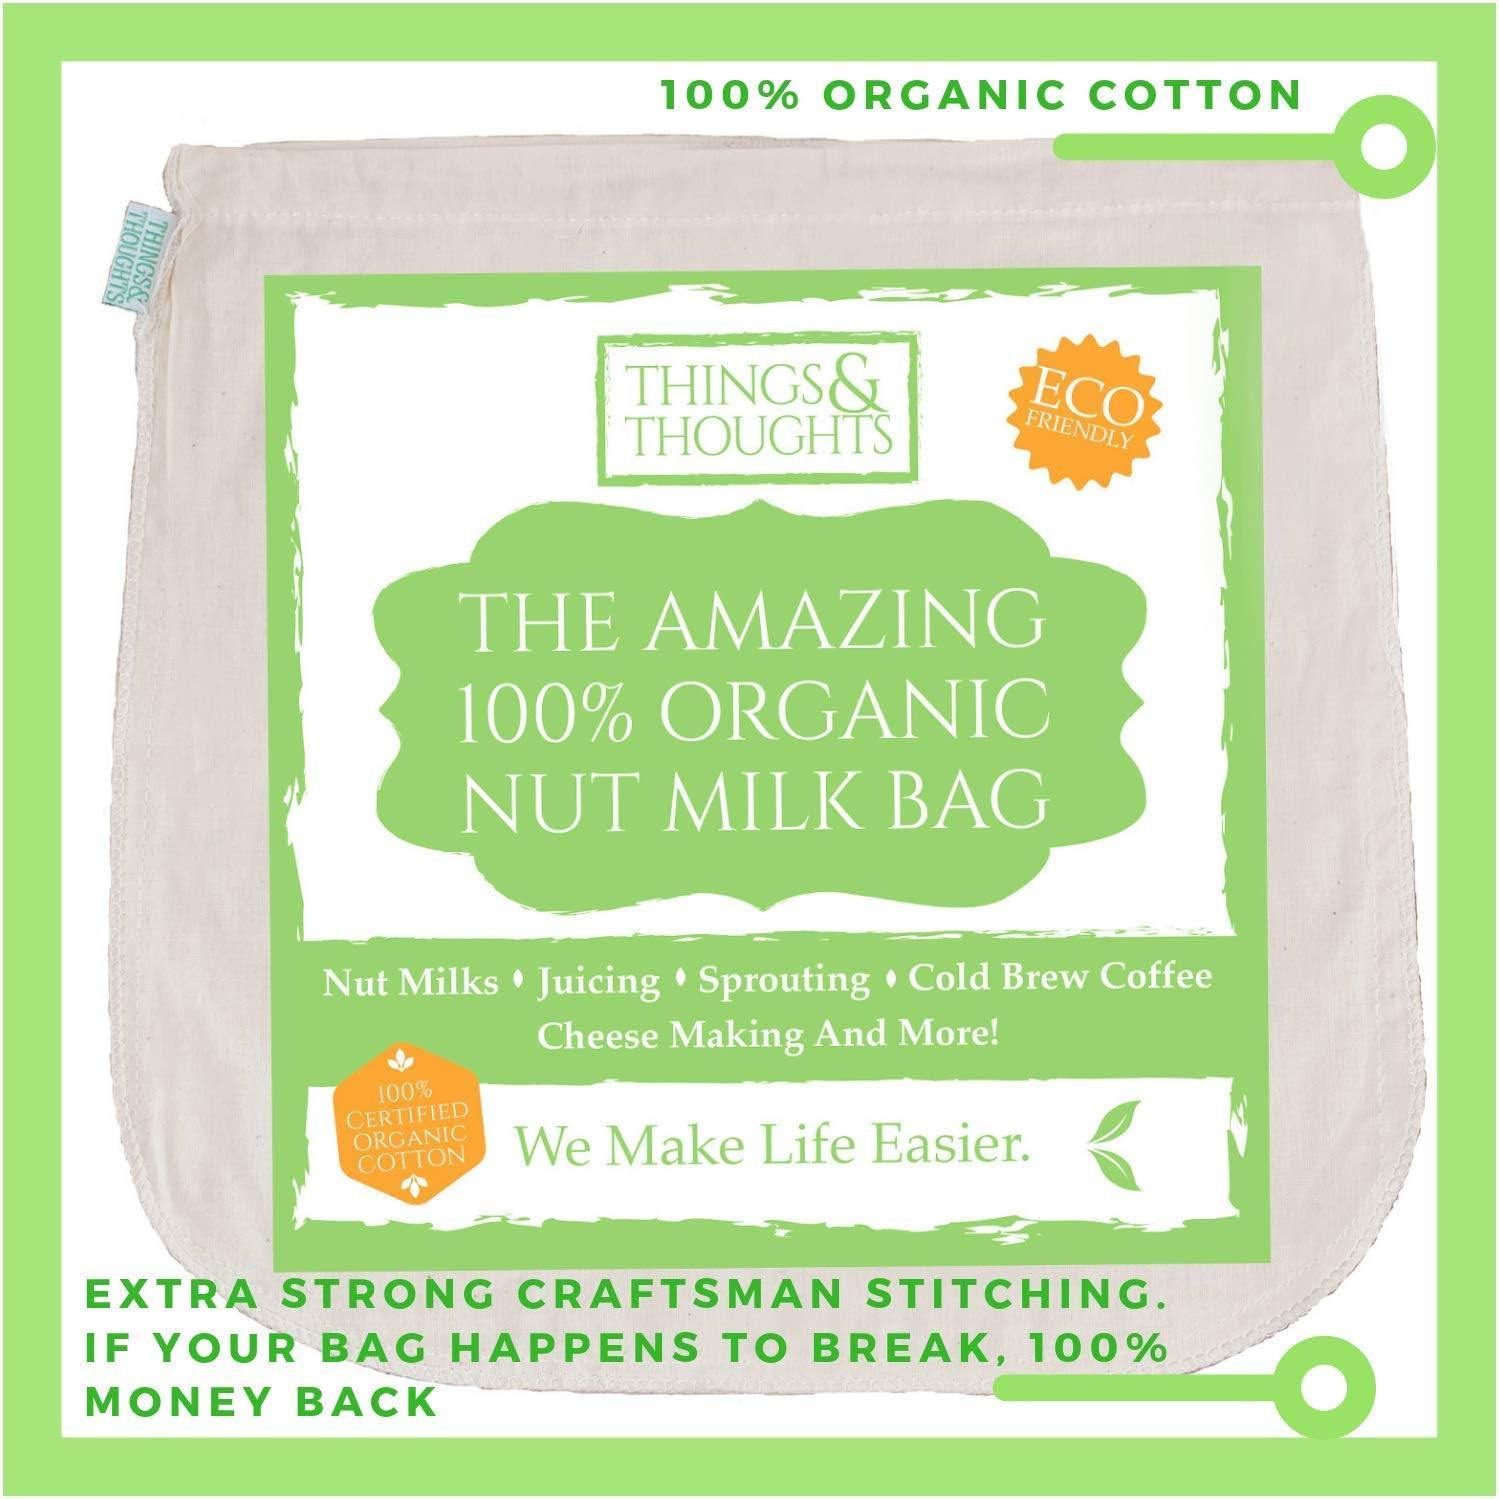 Reusable Nut Almond Milk Strainer Bag Tea Coffee juices Filter Strainer BaK*YNA